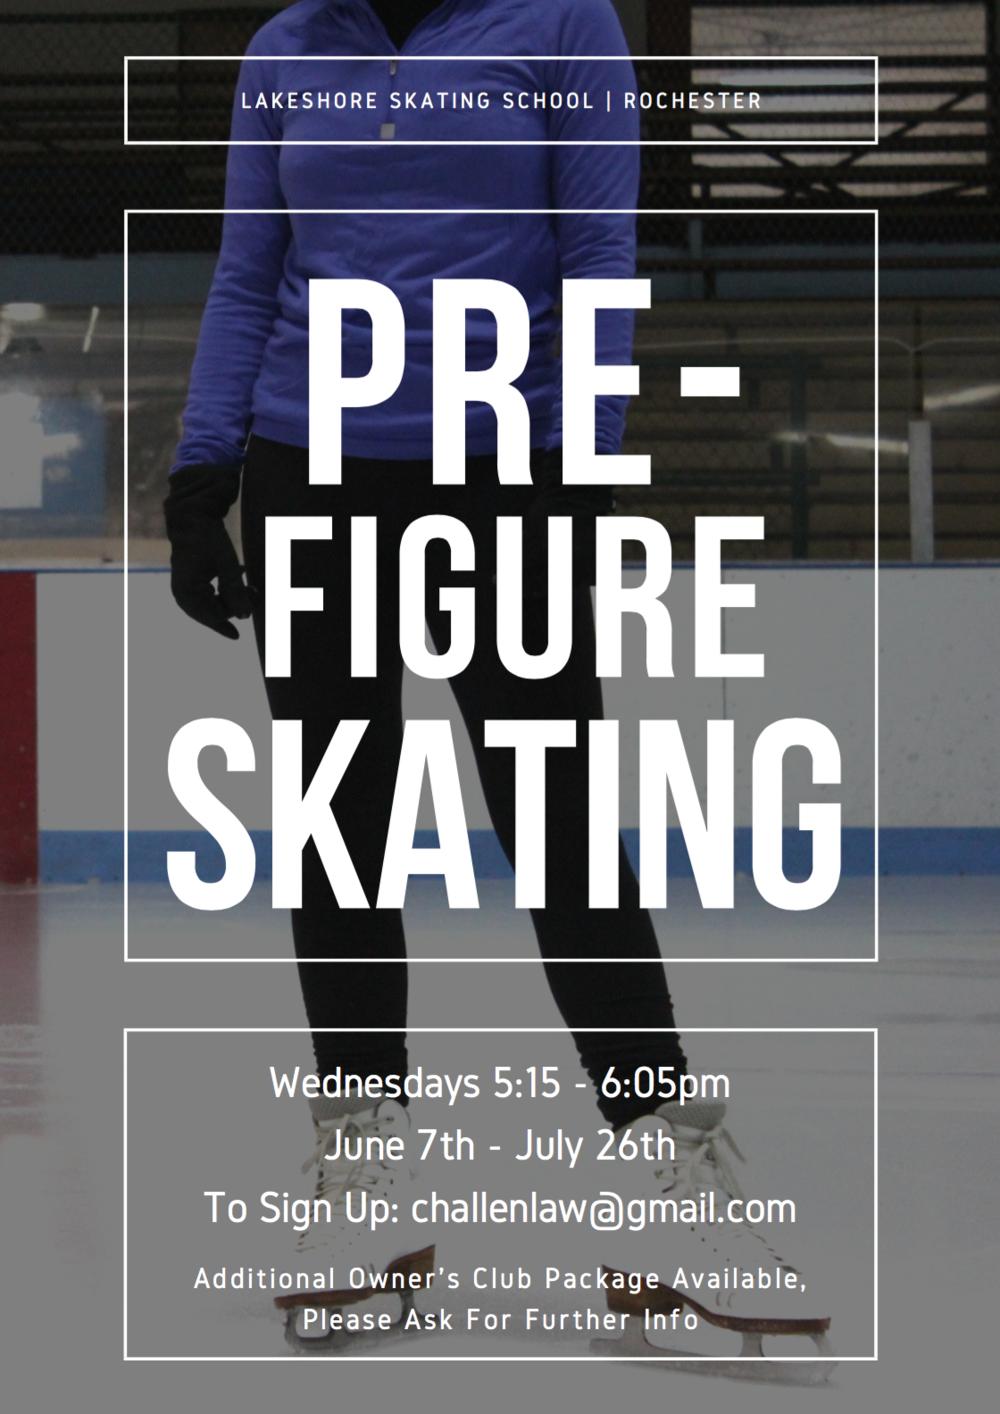 Flyer for Lakeshore Skating School